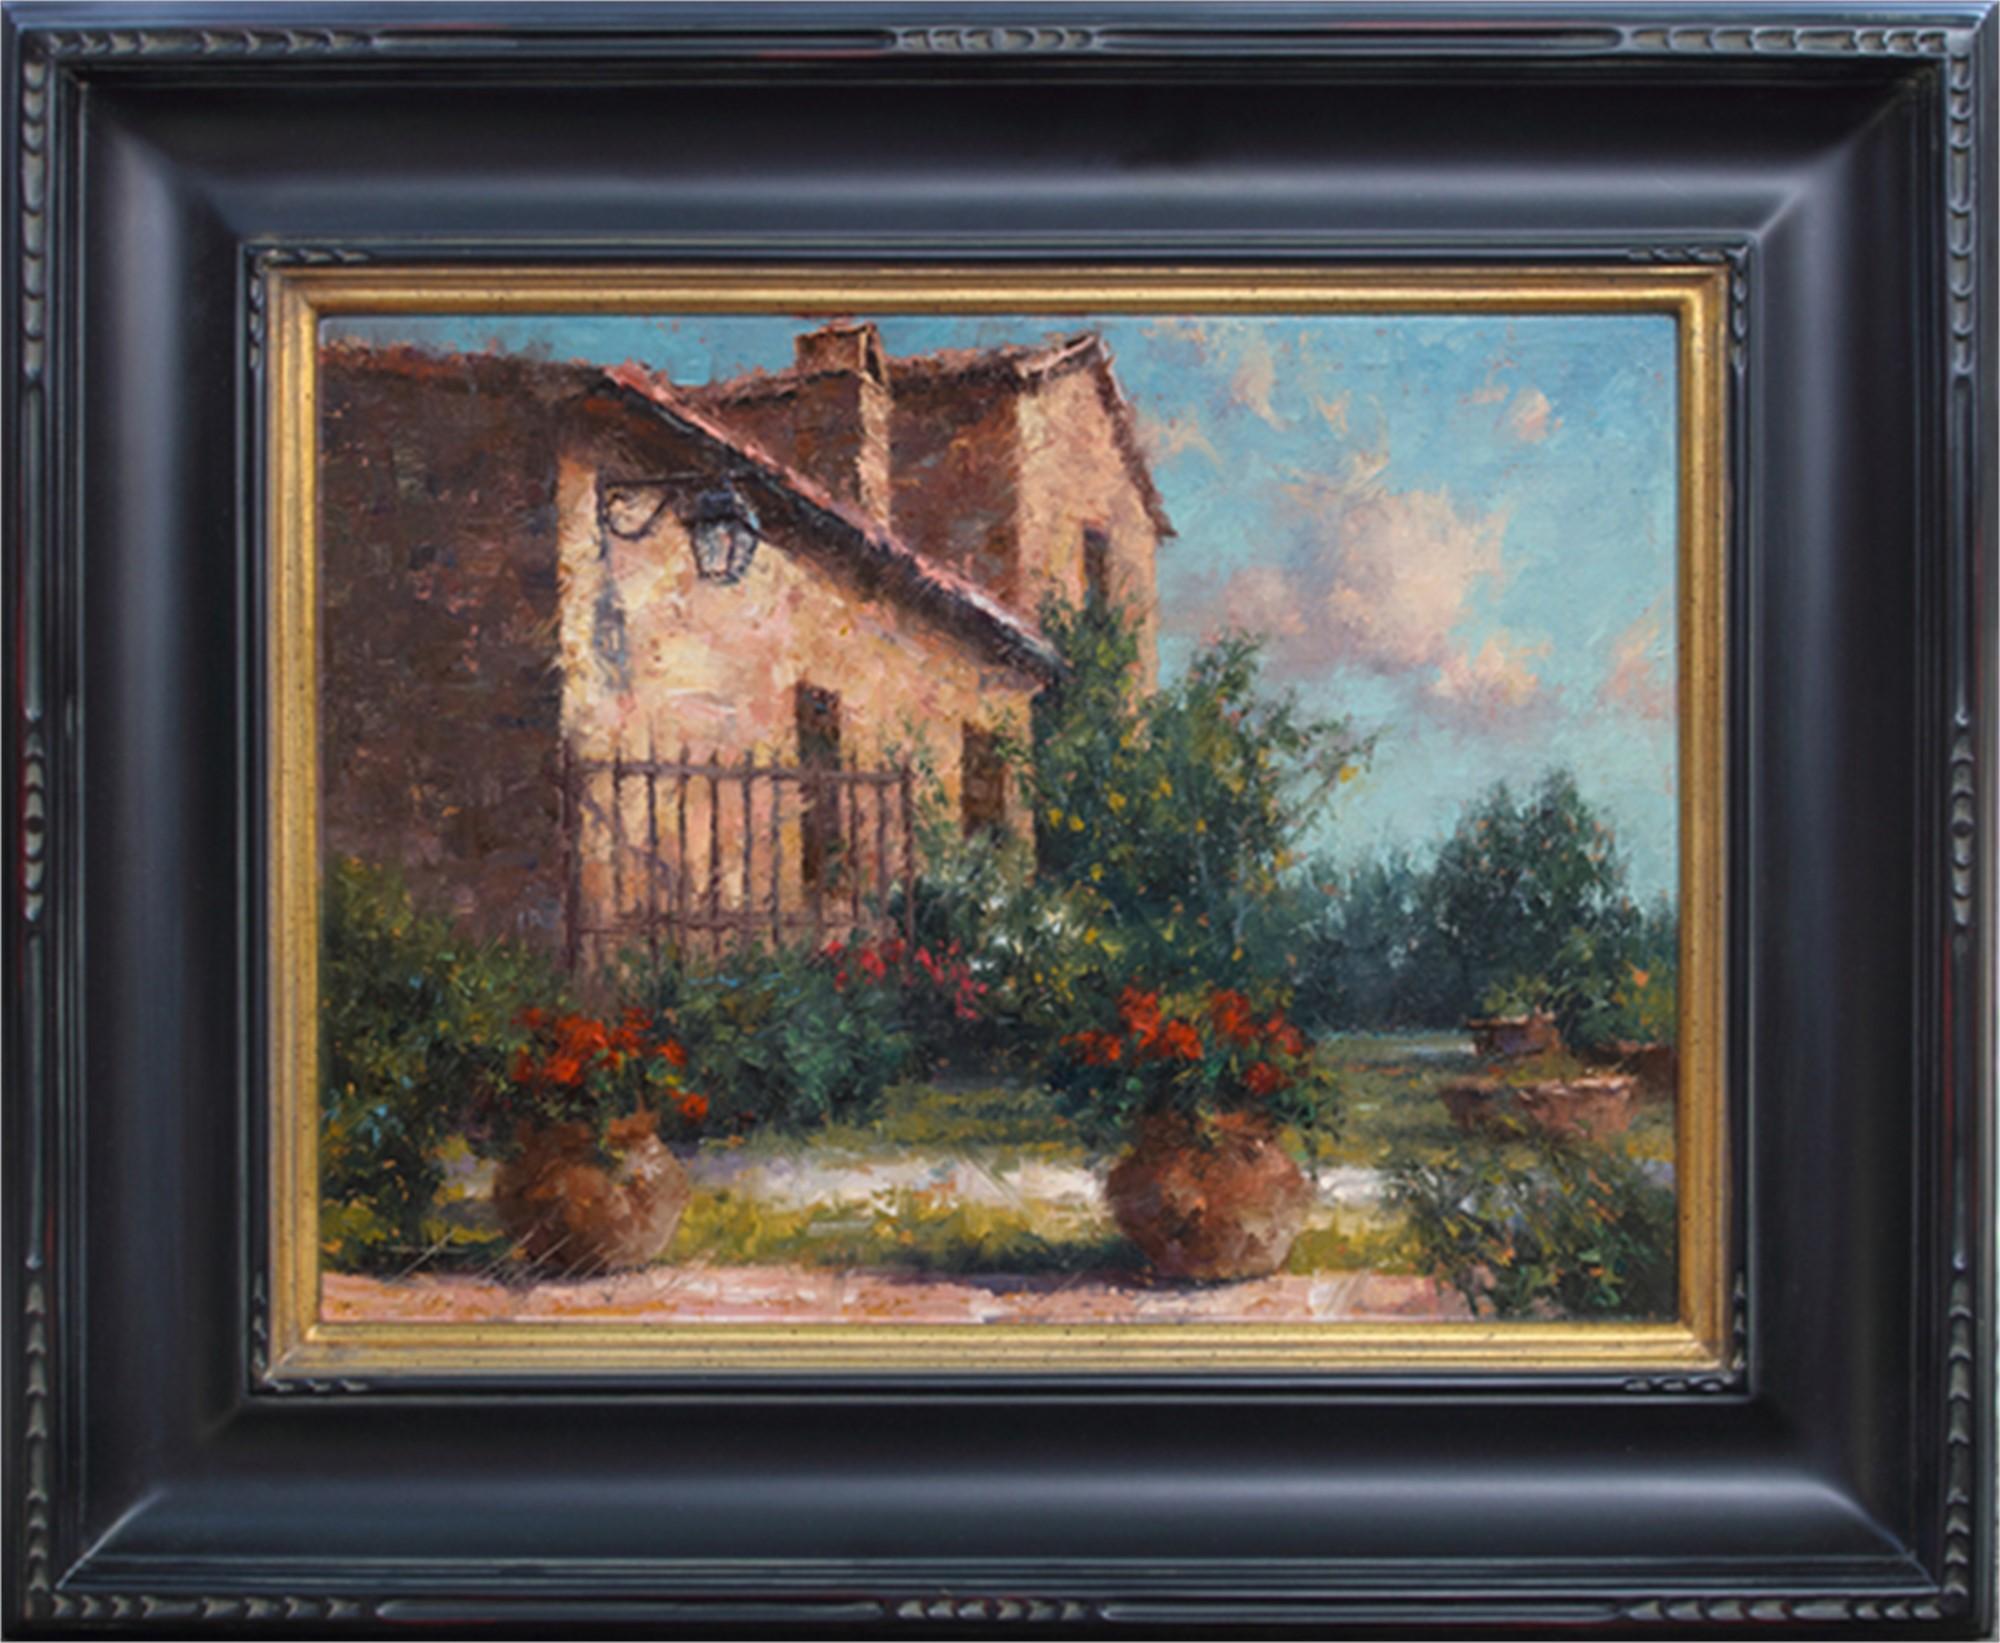 Cretaiole Toscana by Todd A. Williams